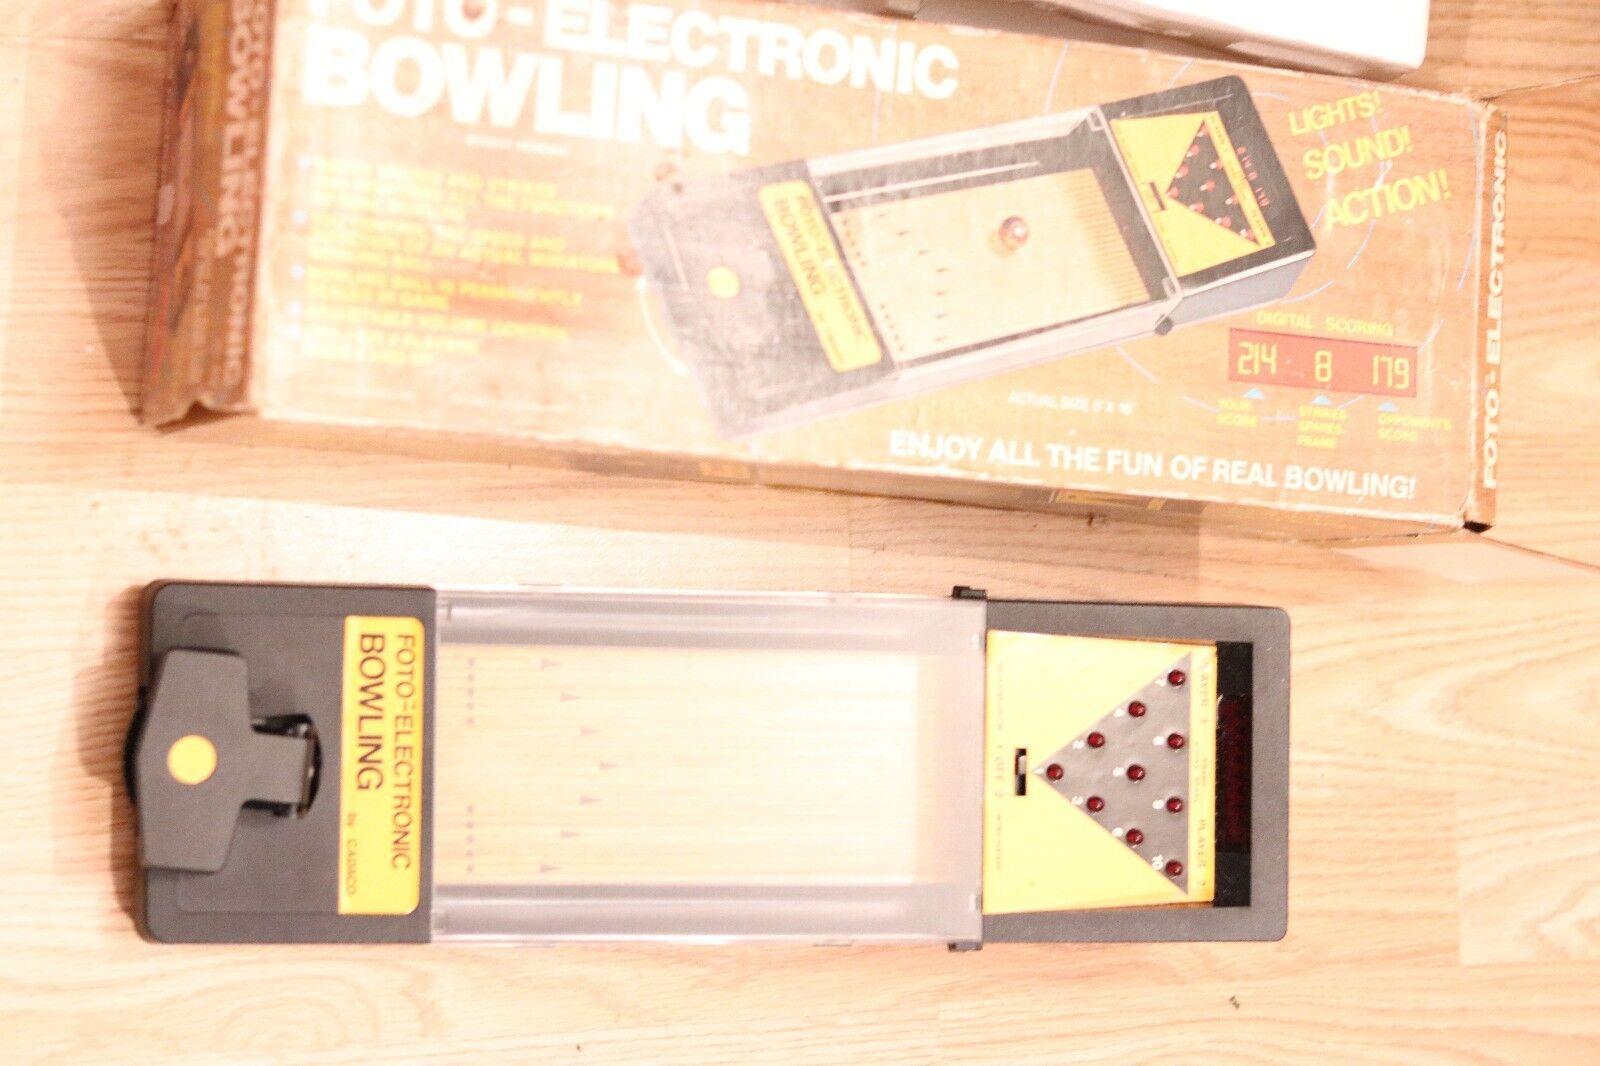 Vintage Rare Foto-ELECTRONIC BOWLING jeu par Cadaco 1978